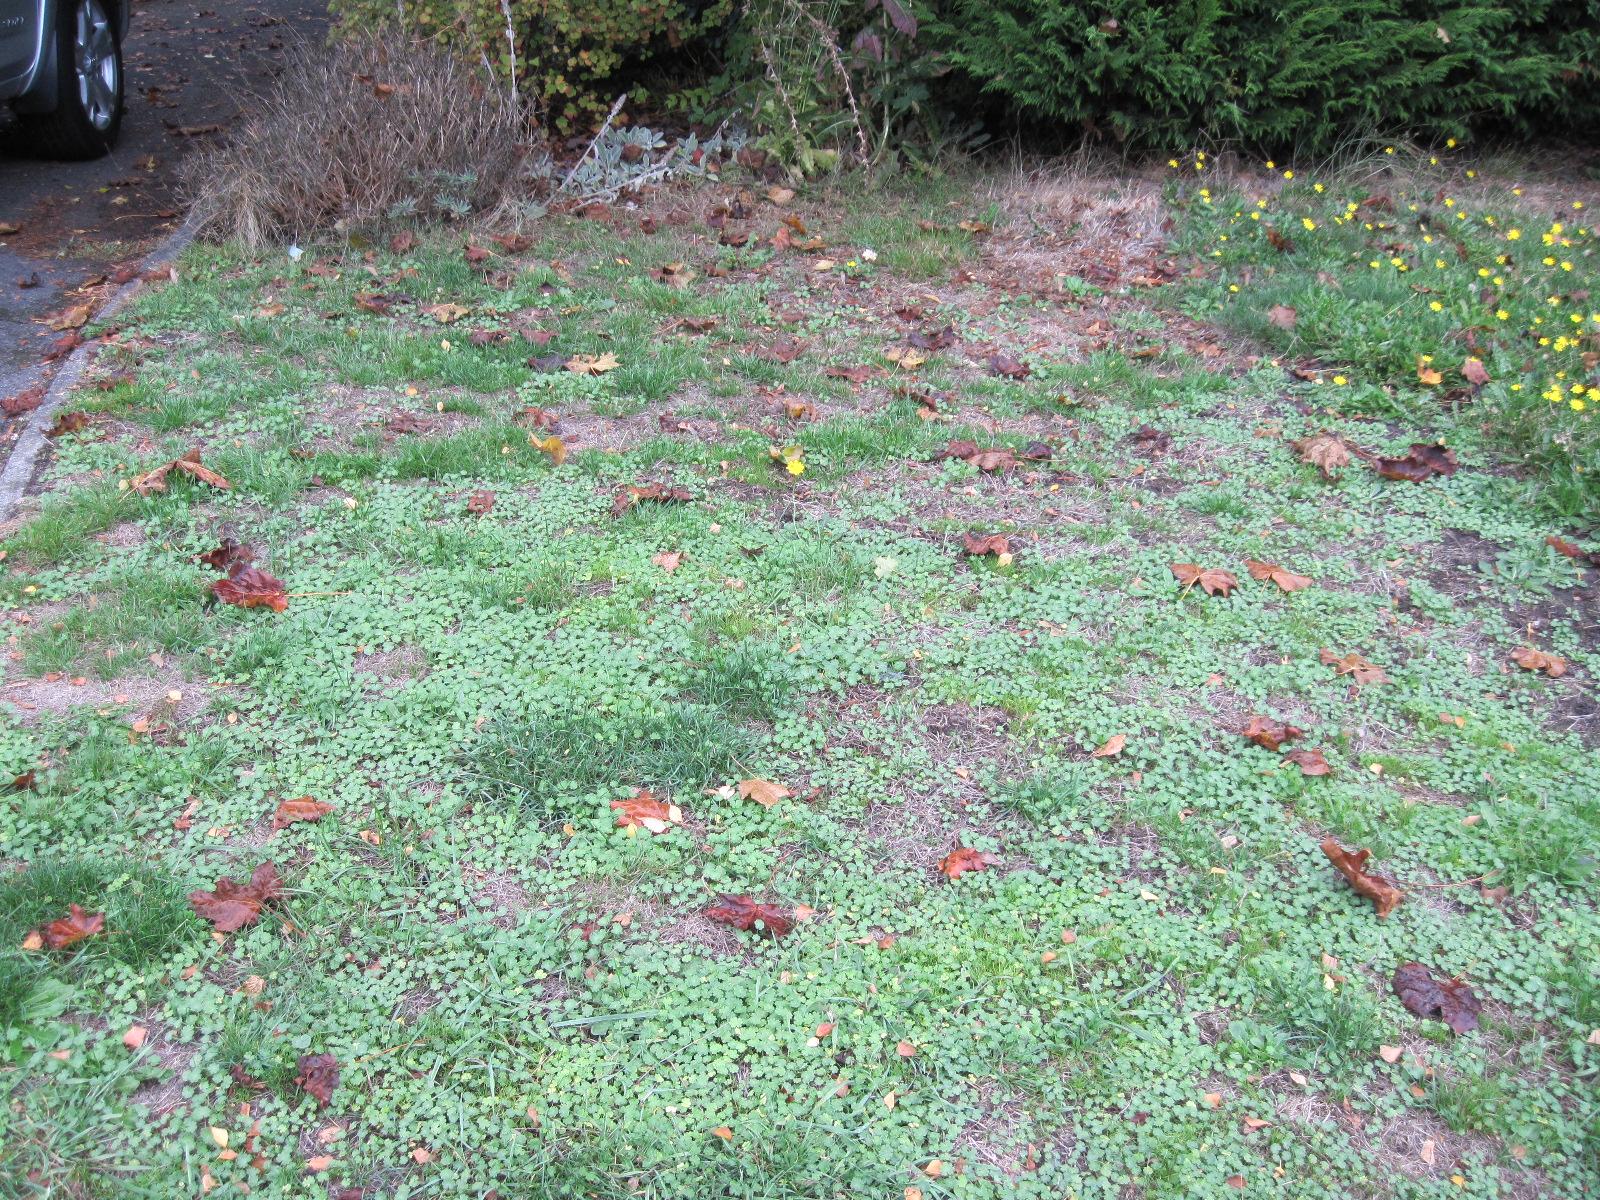 Weeds Audrey Driscolls Blog